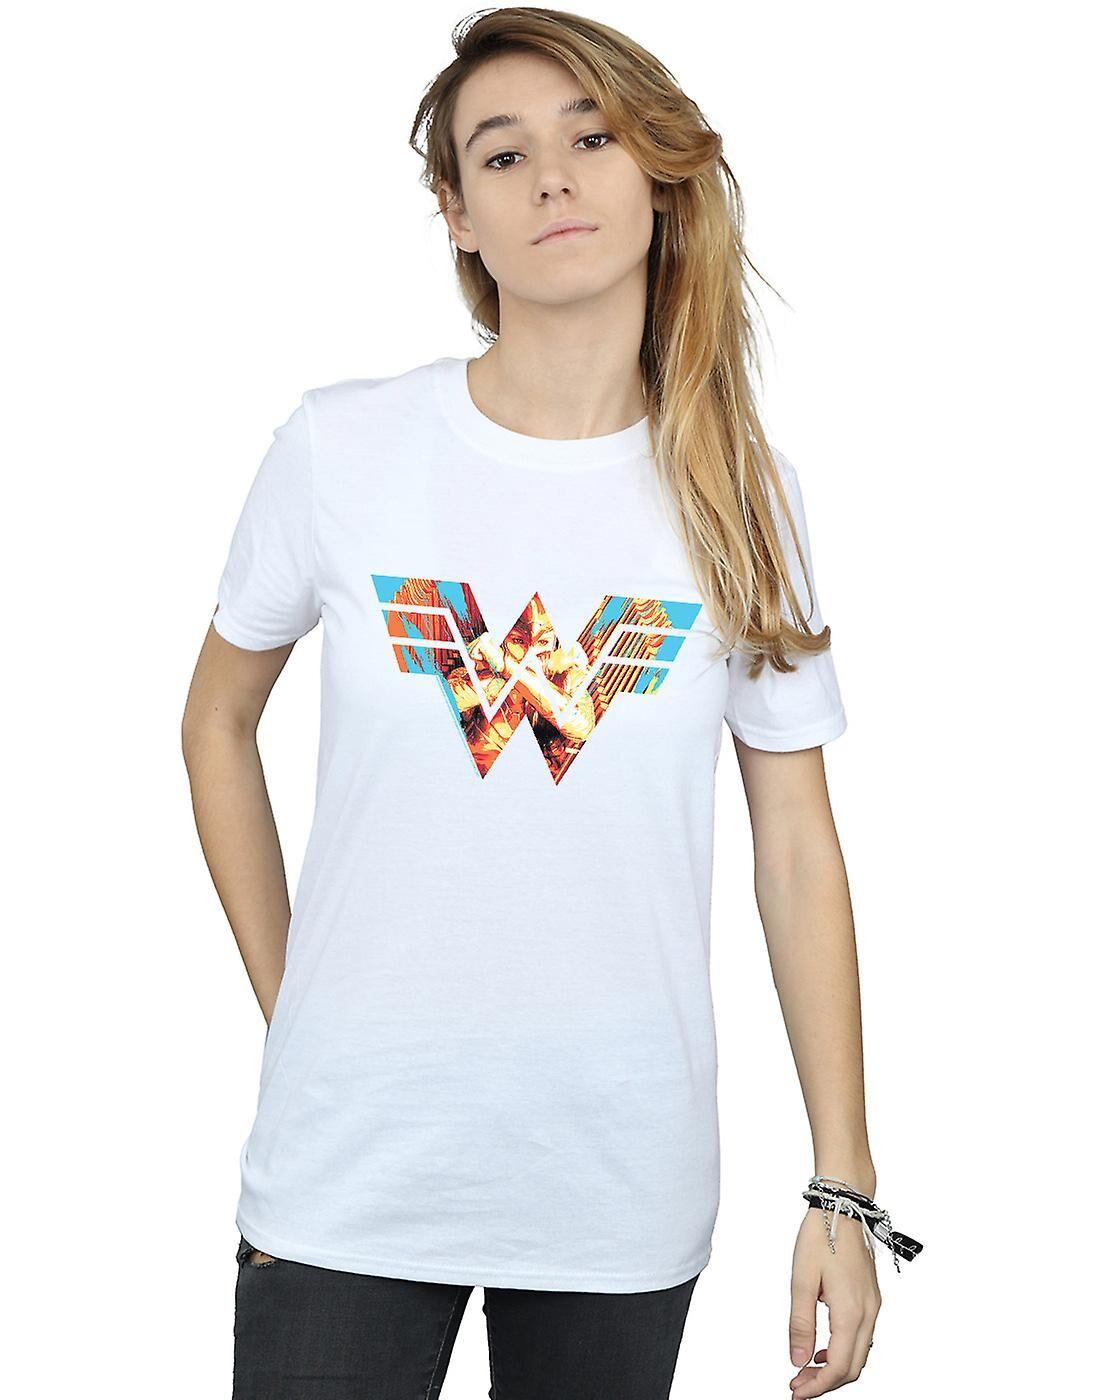 Absolute Cult DC Comics Femmes-apos;s Wonder Woman 84 Symbol Crossed Arms Boyfriend Fit T-Shirt Blanc X-Large